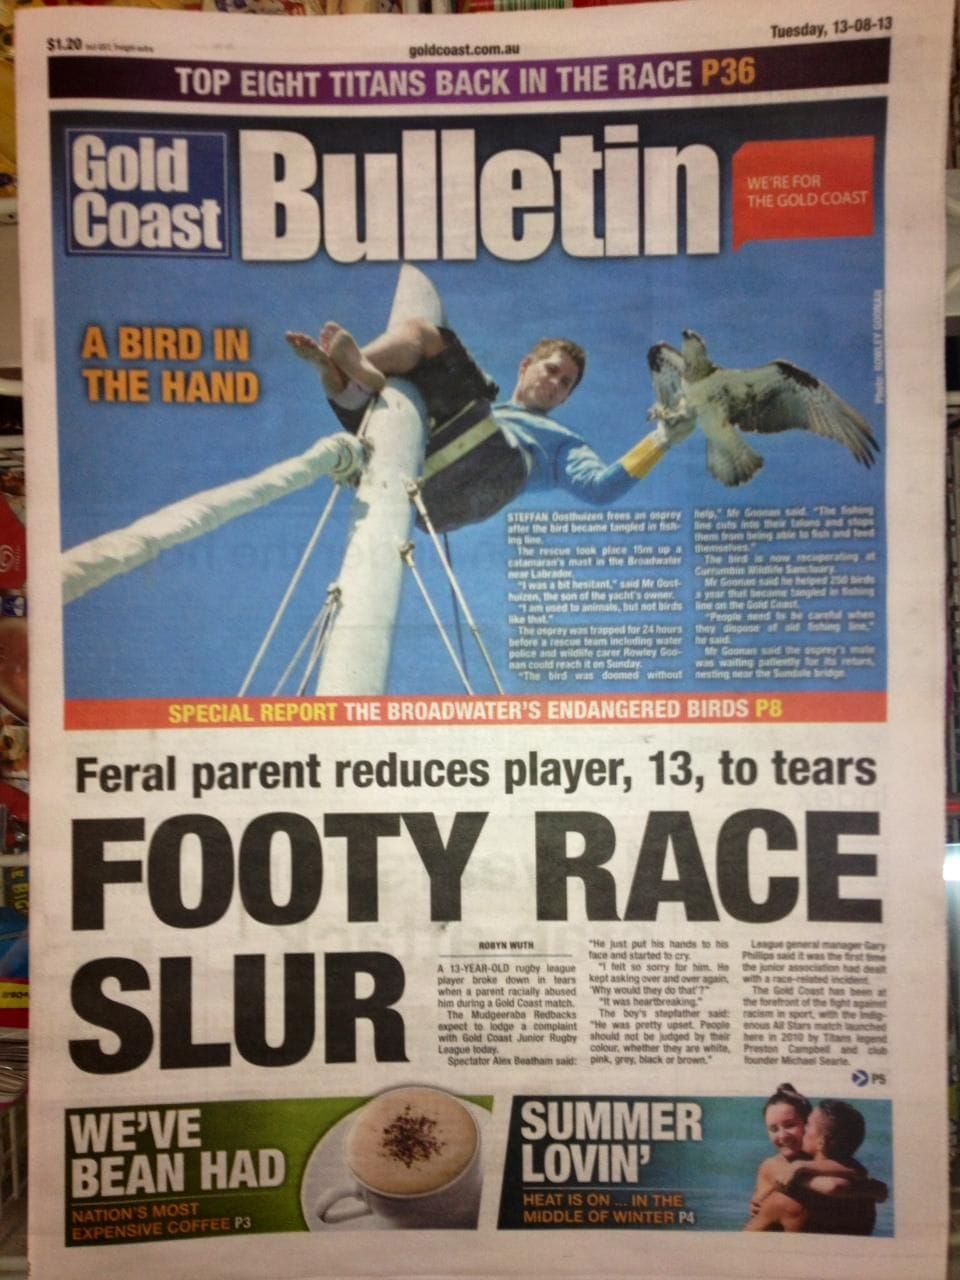 NEWS CORP TO STOP PRESS AT BULLETIN